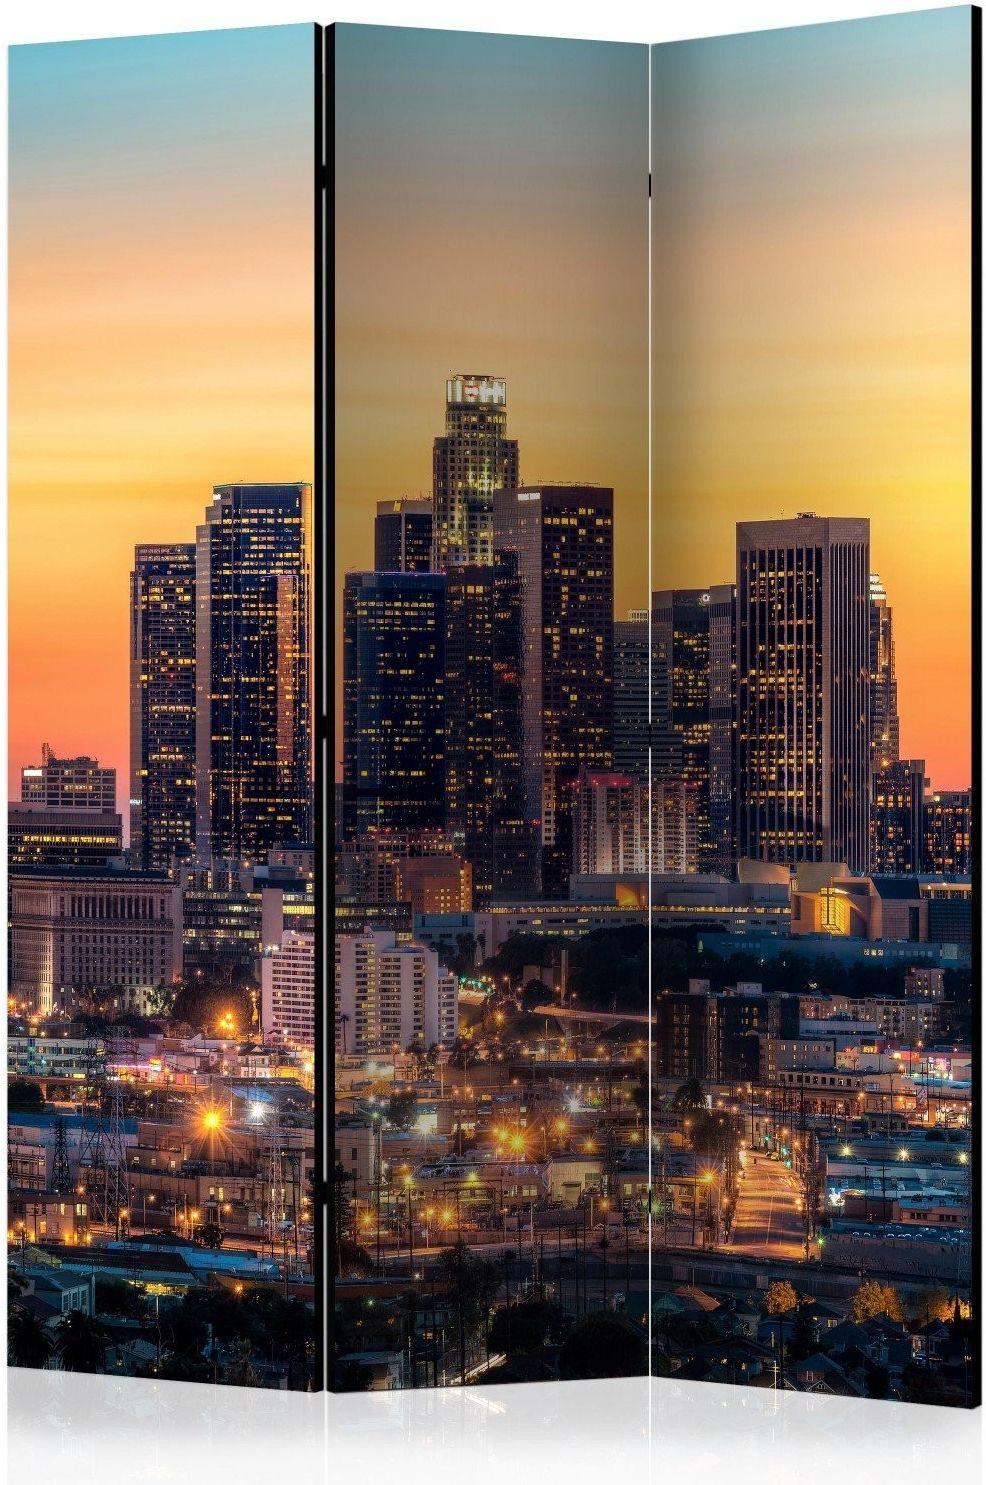 Parawan 3-częściowy - kalifornijski wieczór [room dividers]